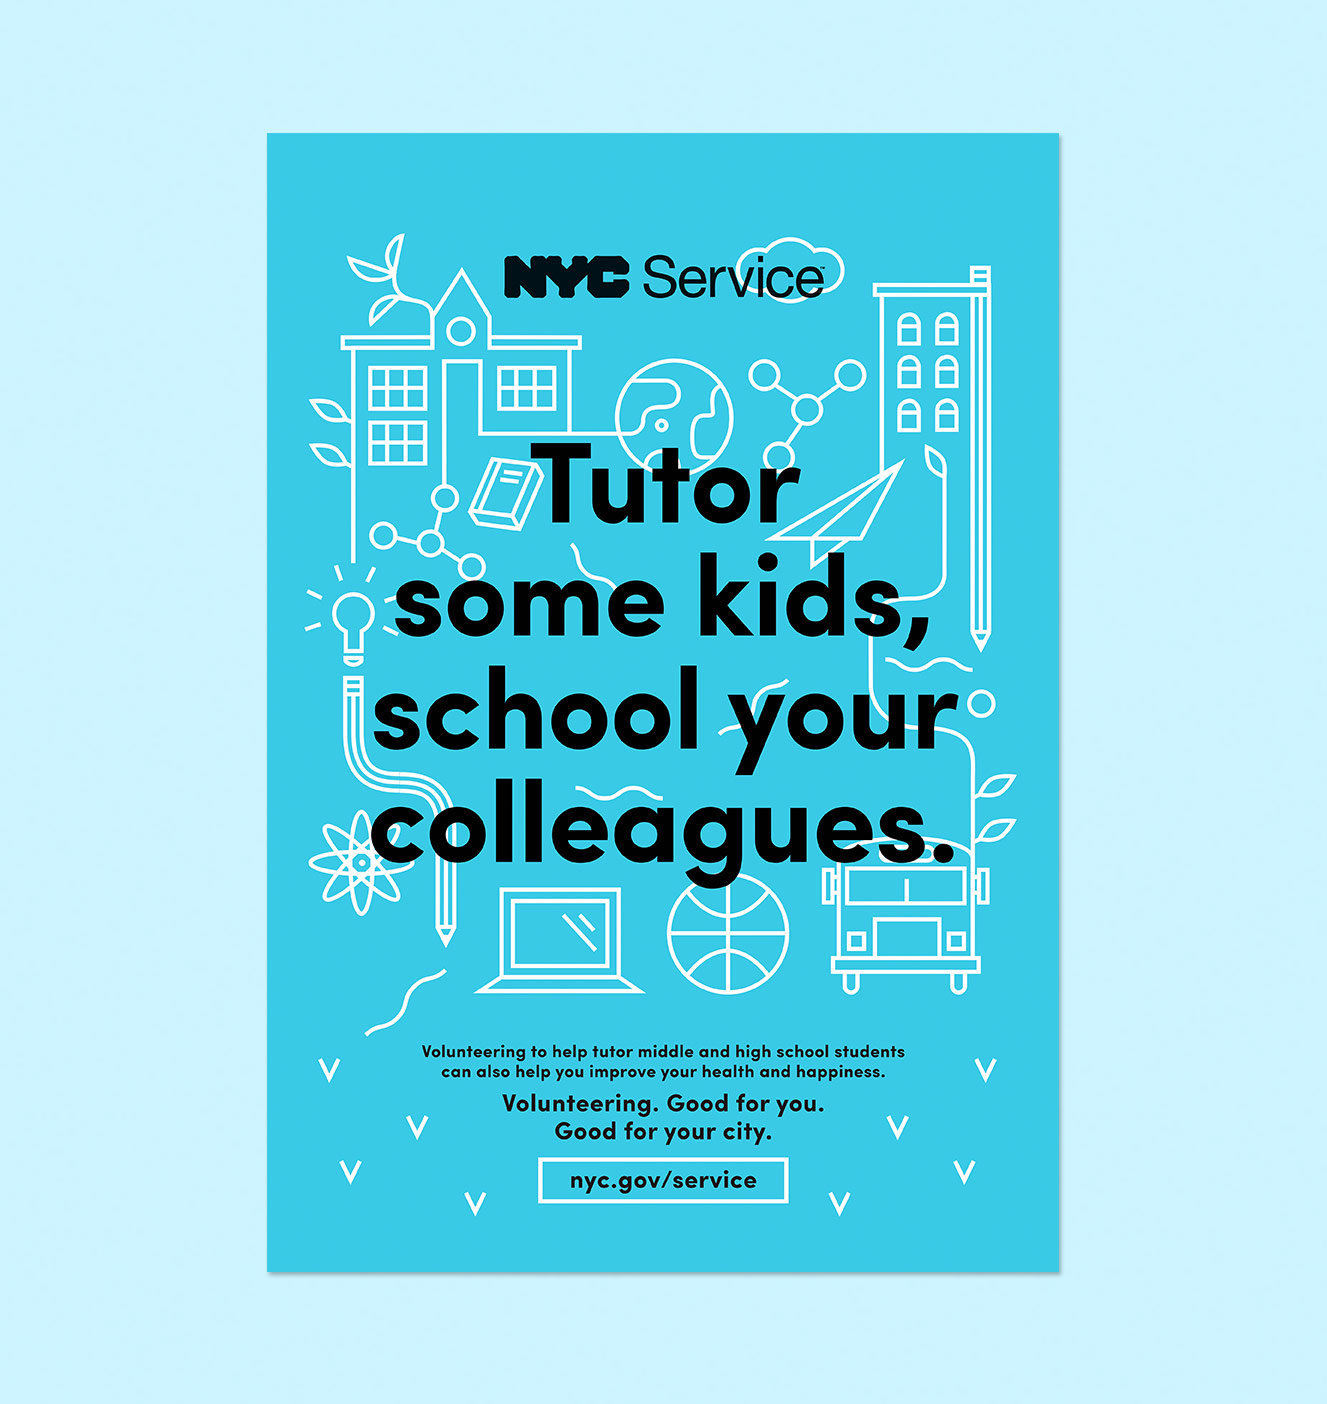 NYC_Service_2018_1